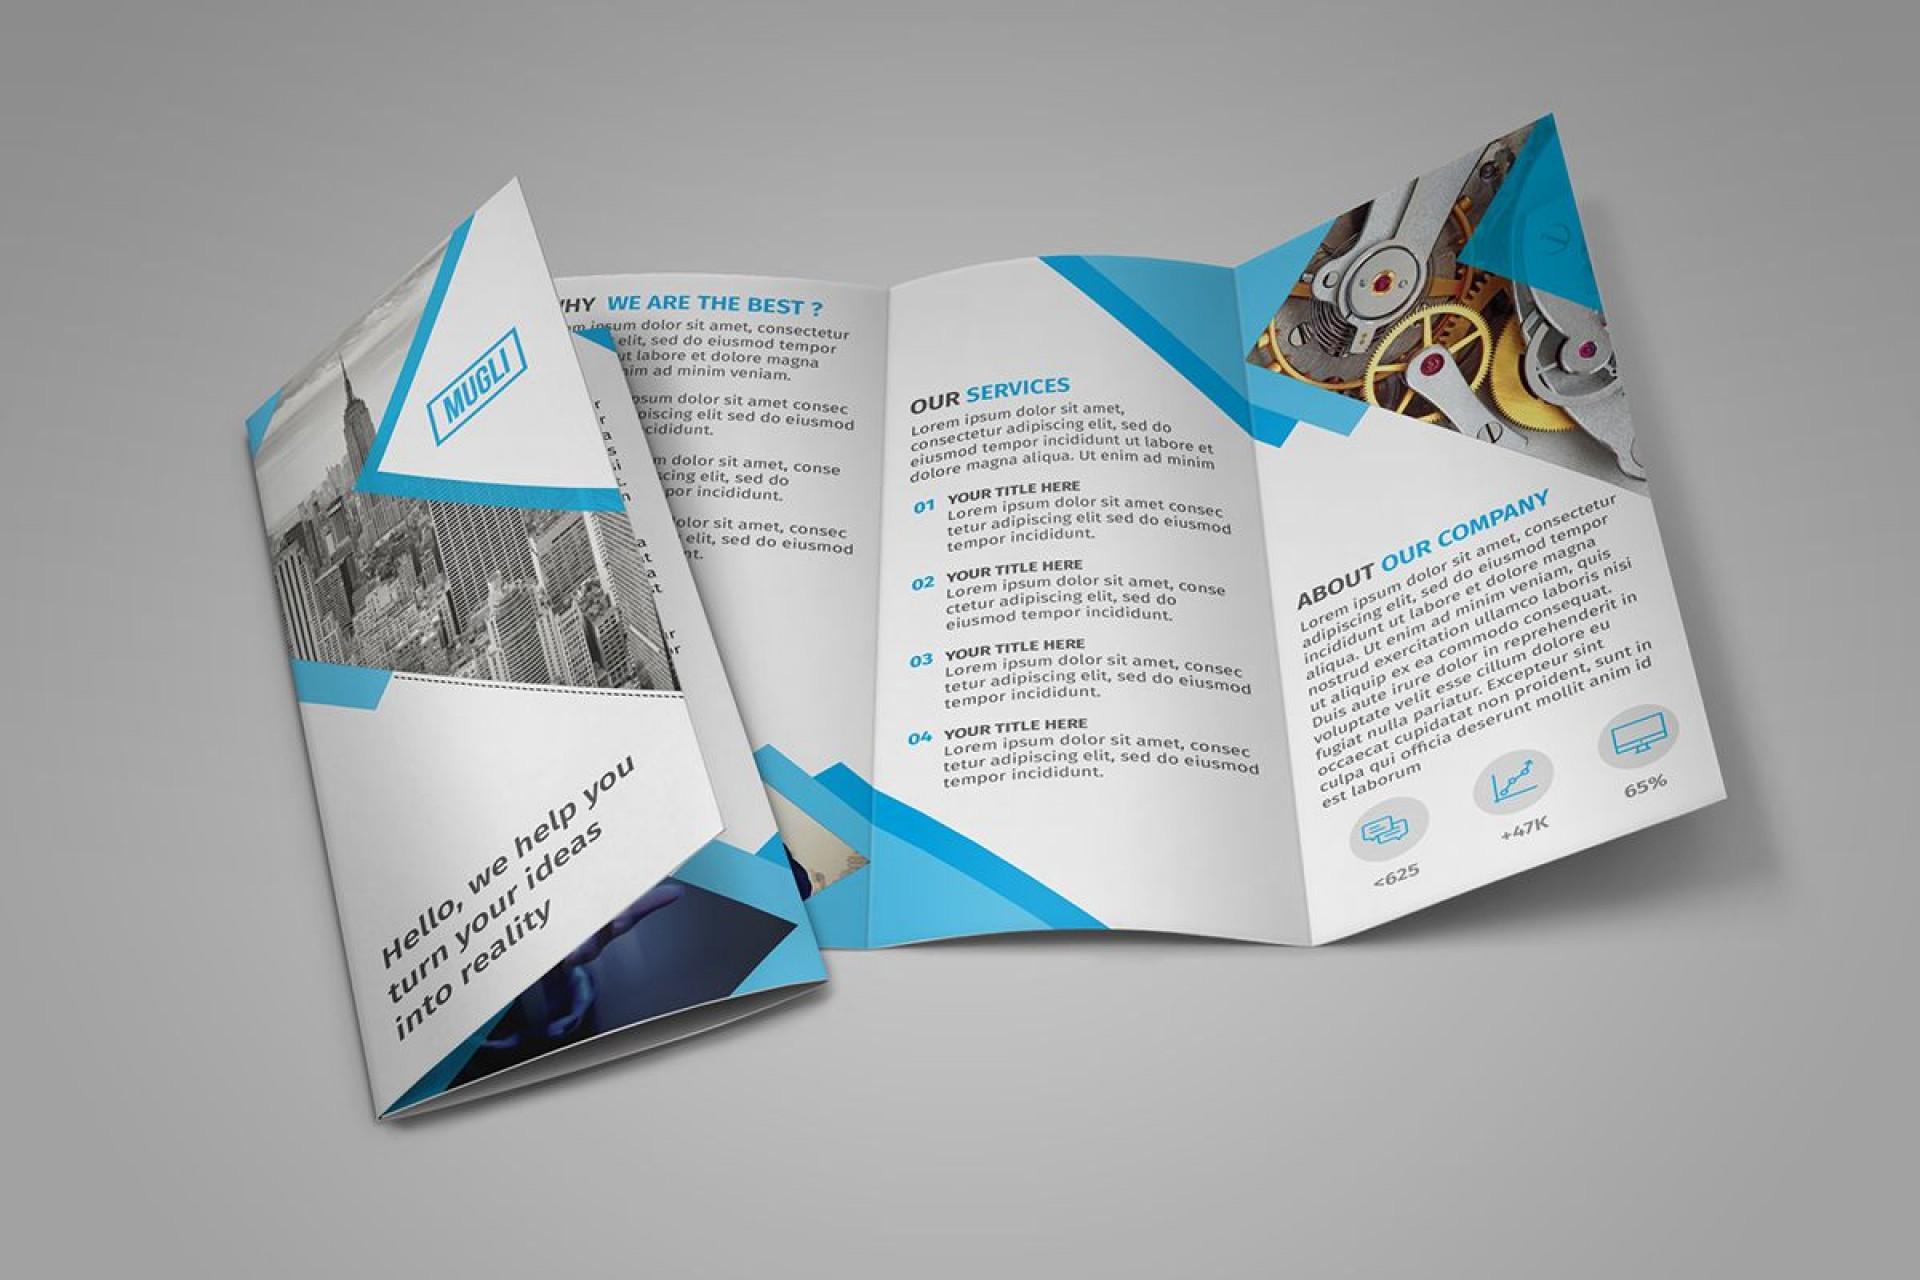 002 Singular Three Fold Brochure Template Psd Photo  Free 3 A4 Tri Download1920